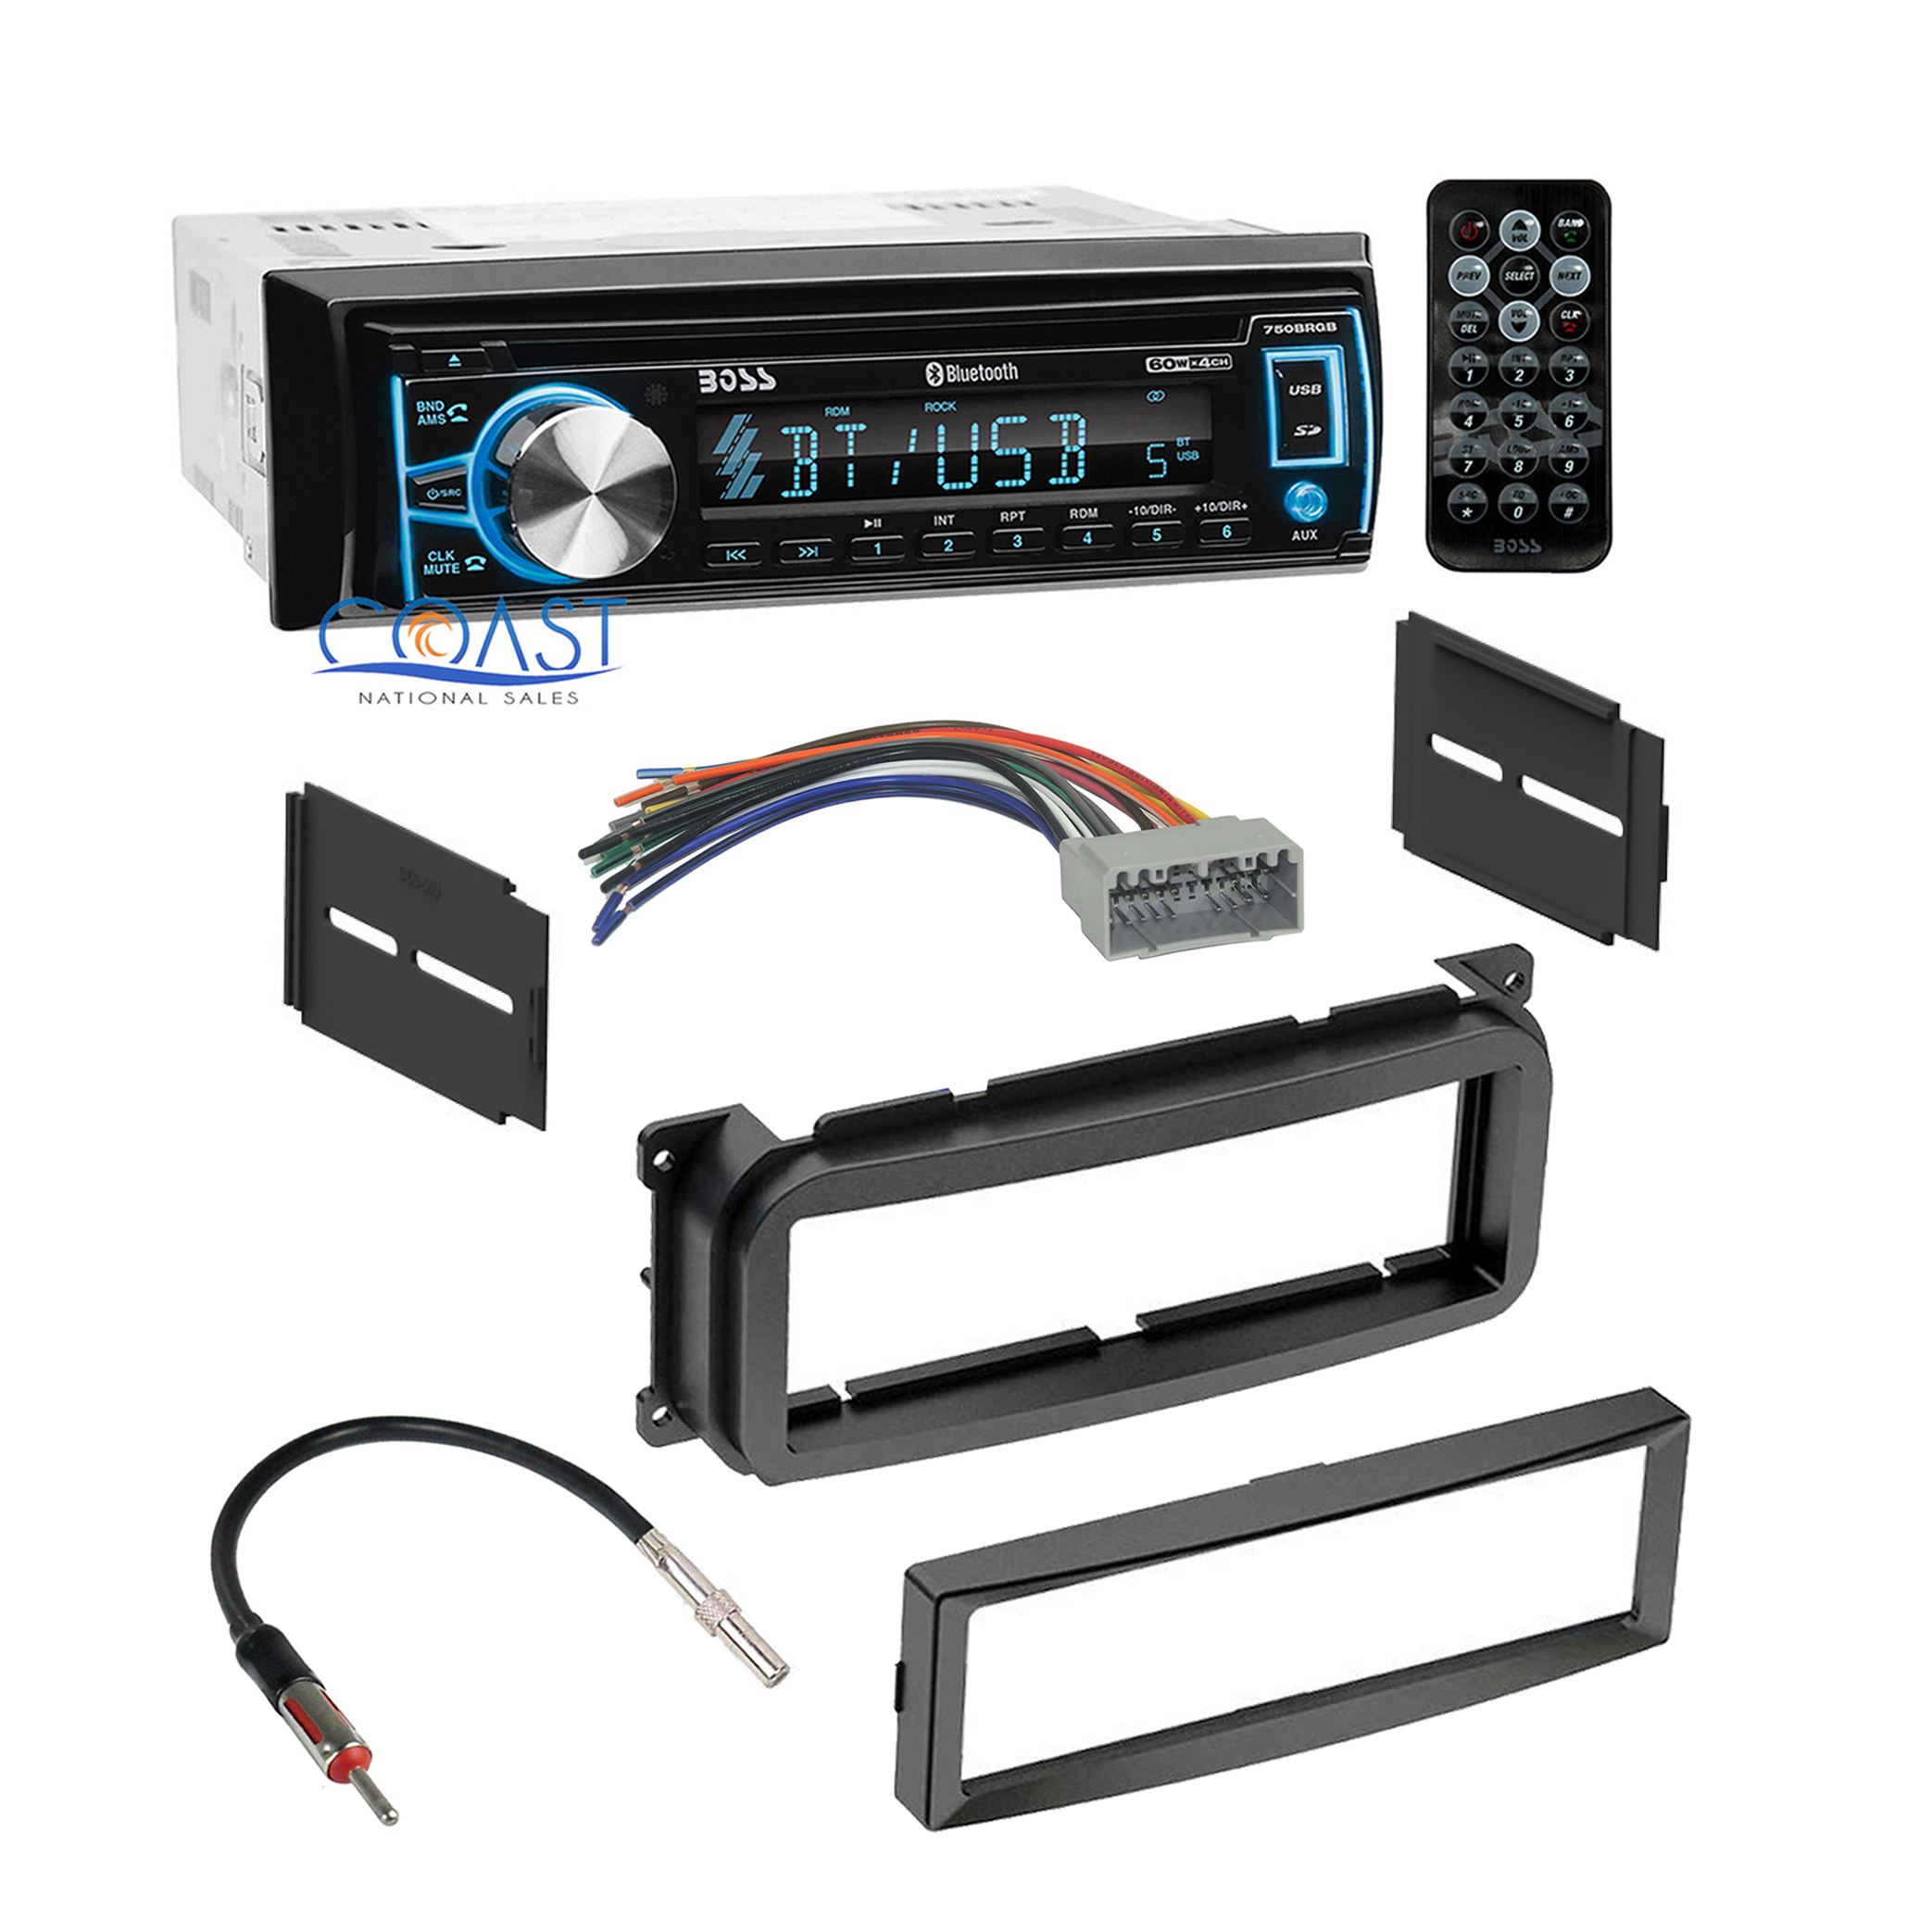 pt cruiser cd player wiring diagram sodium light ballast boss bluetooth car radio stereo dash kit harness for 2002